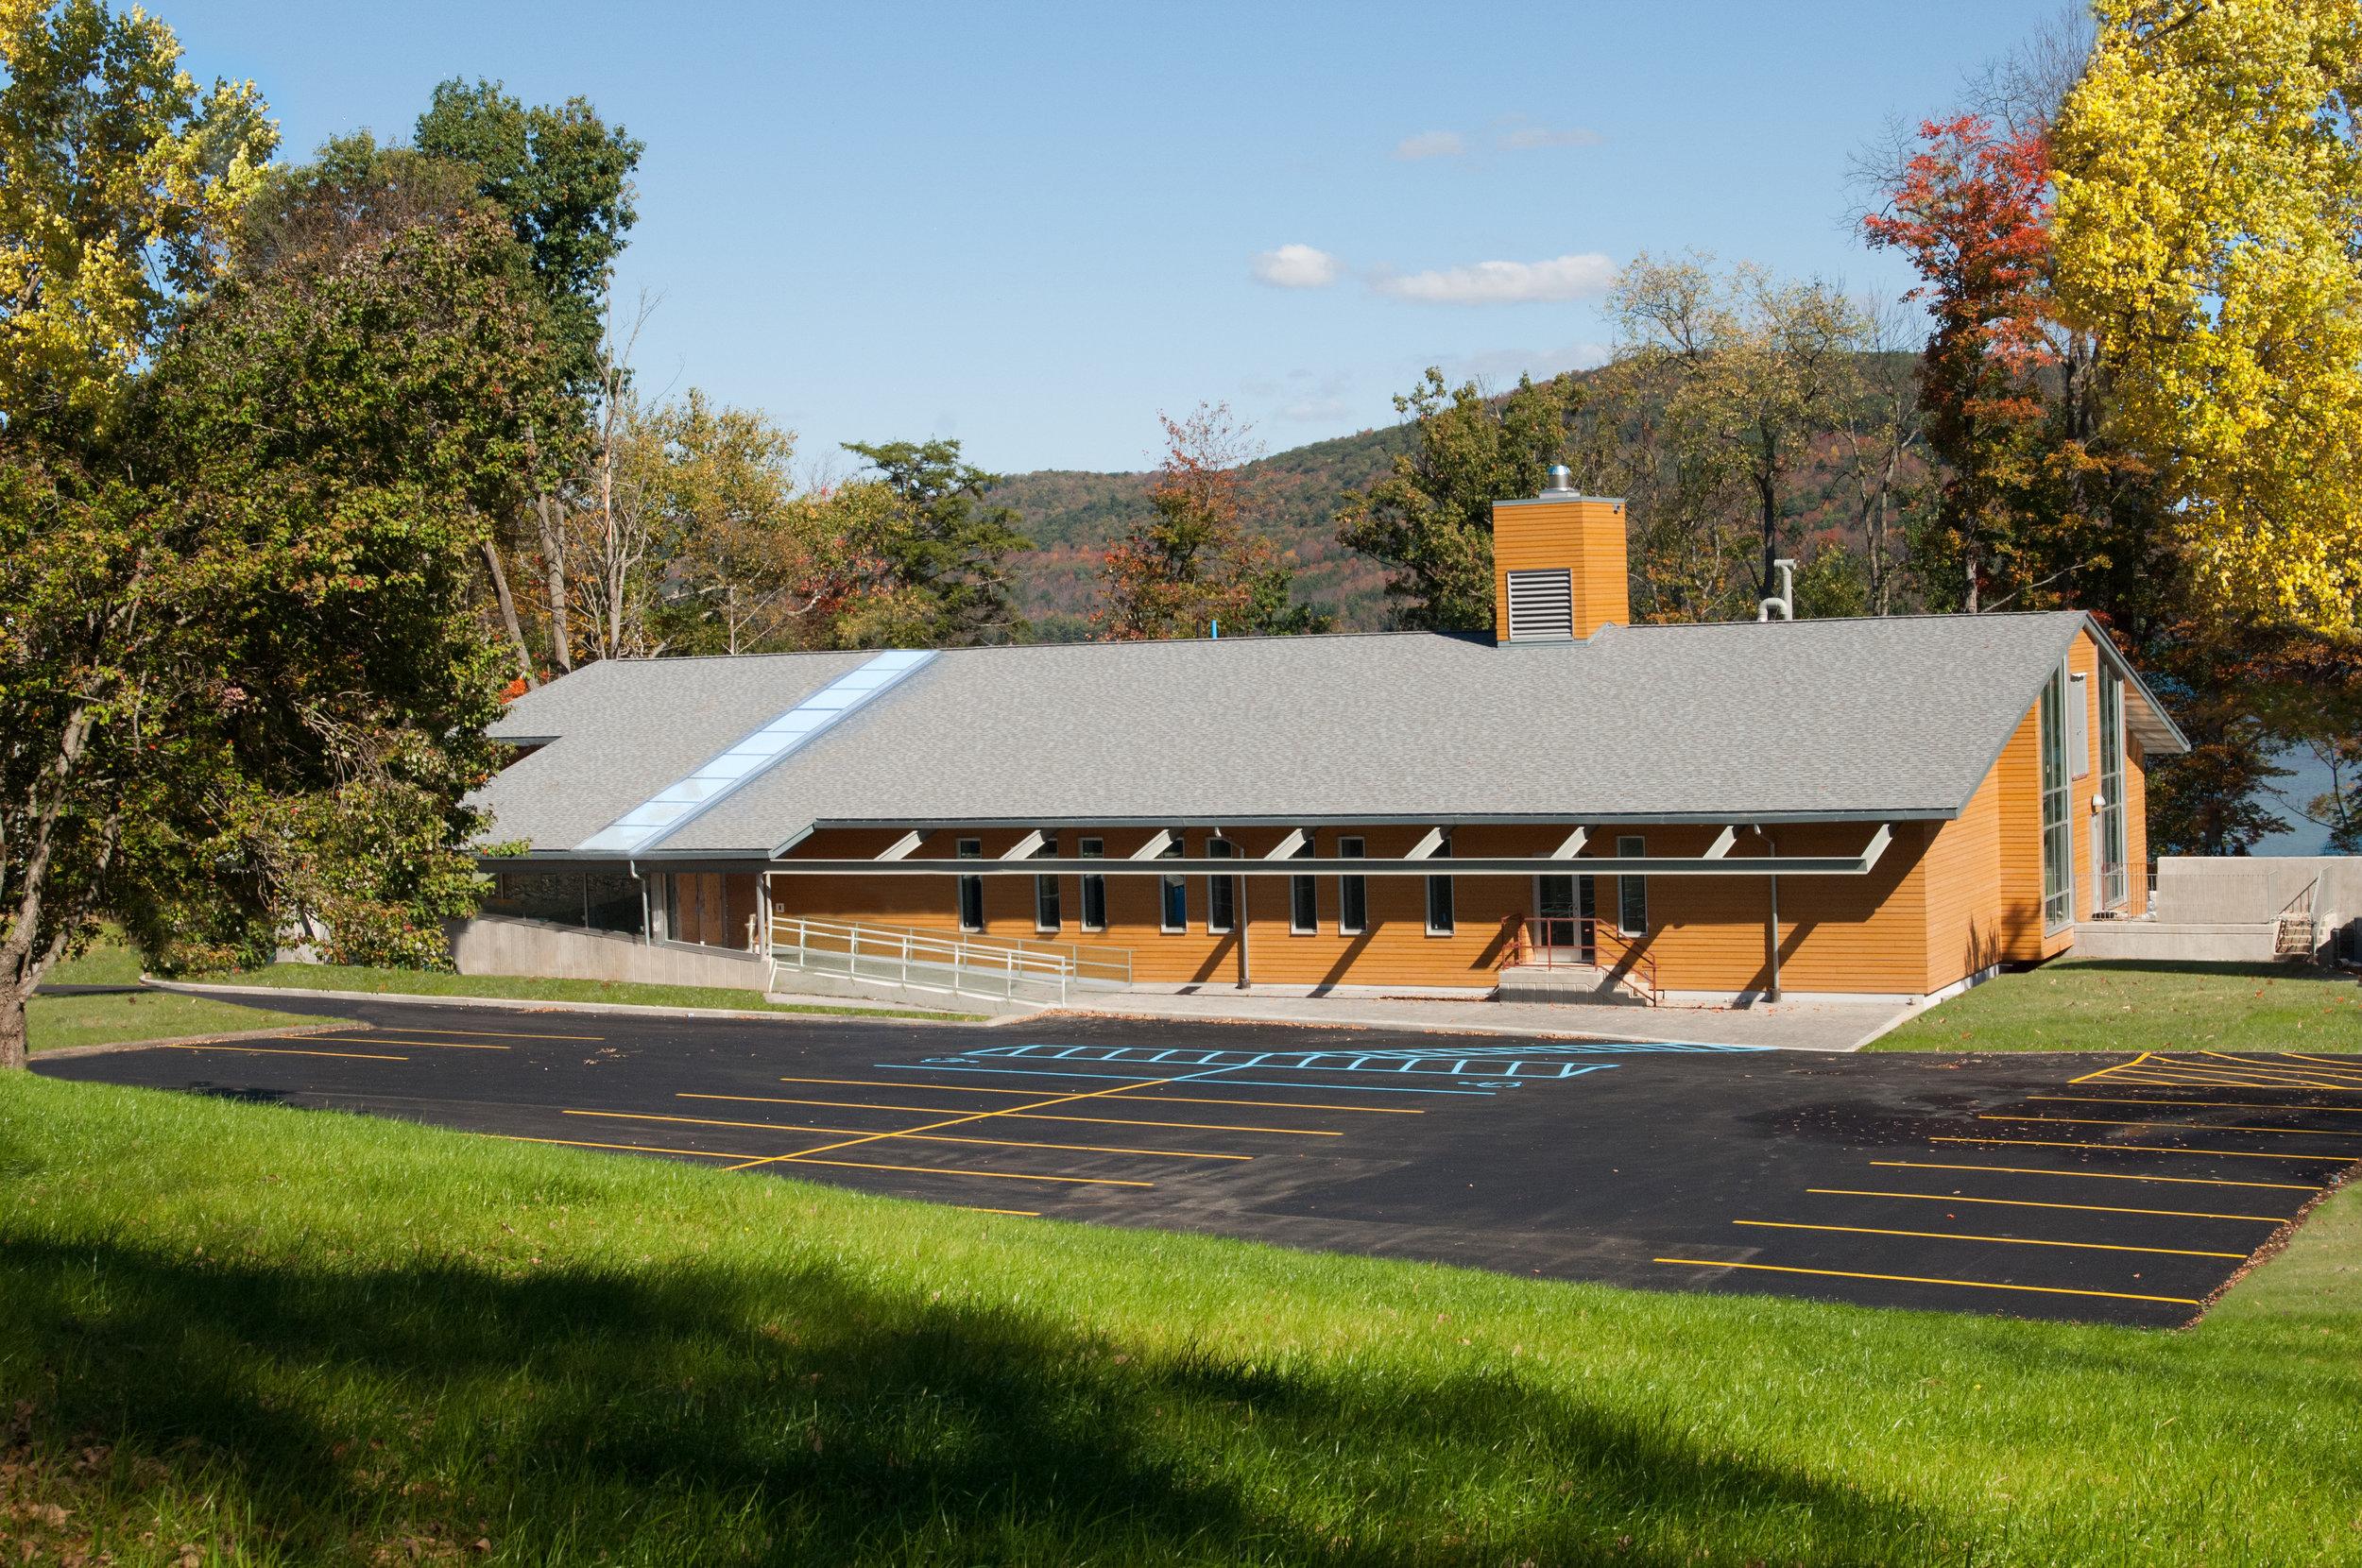 The Cooperstown Graduate Program building